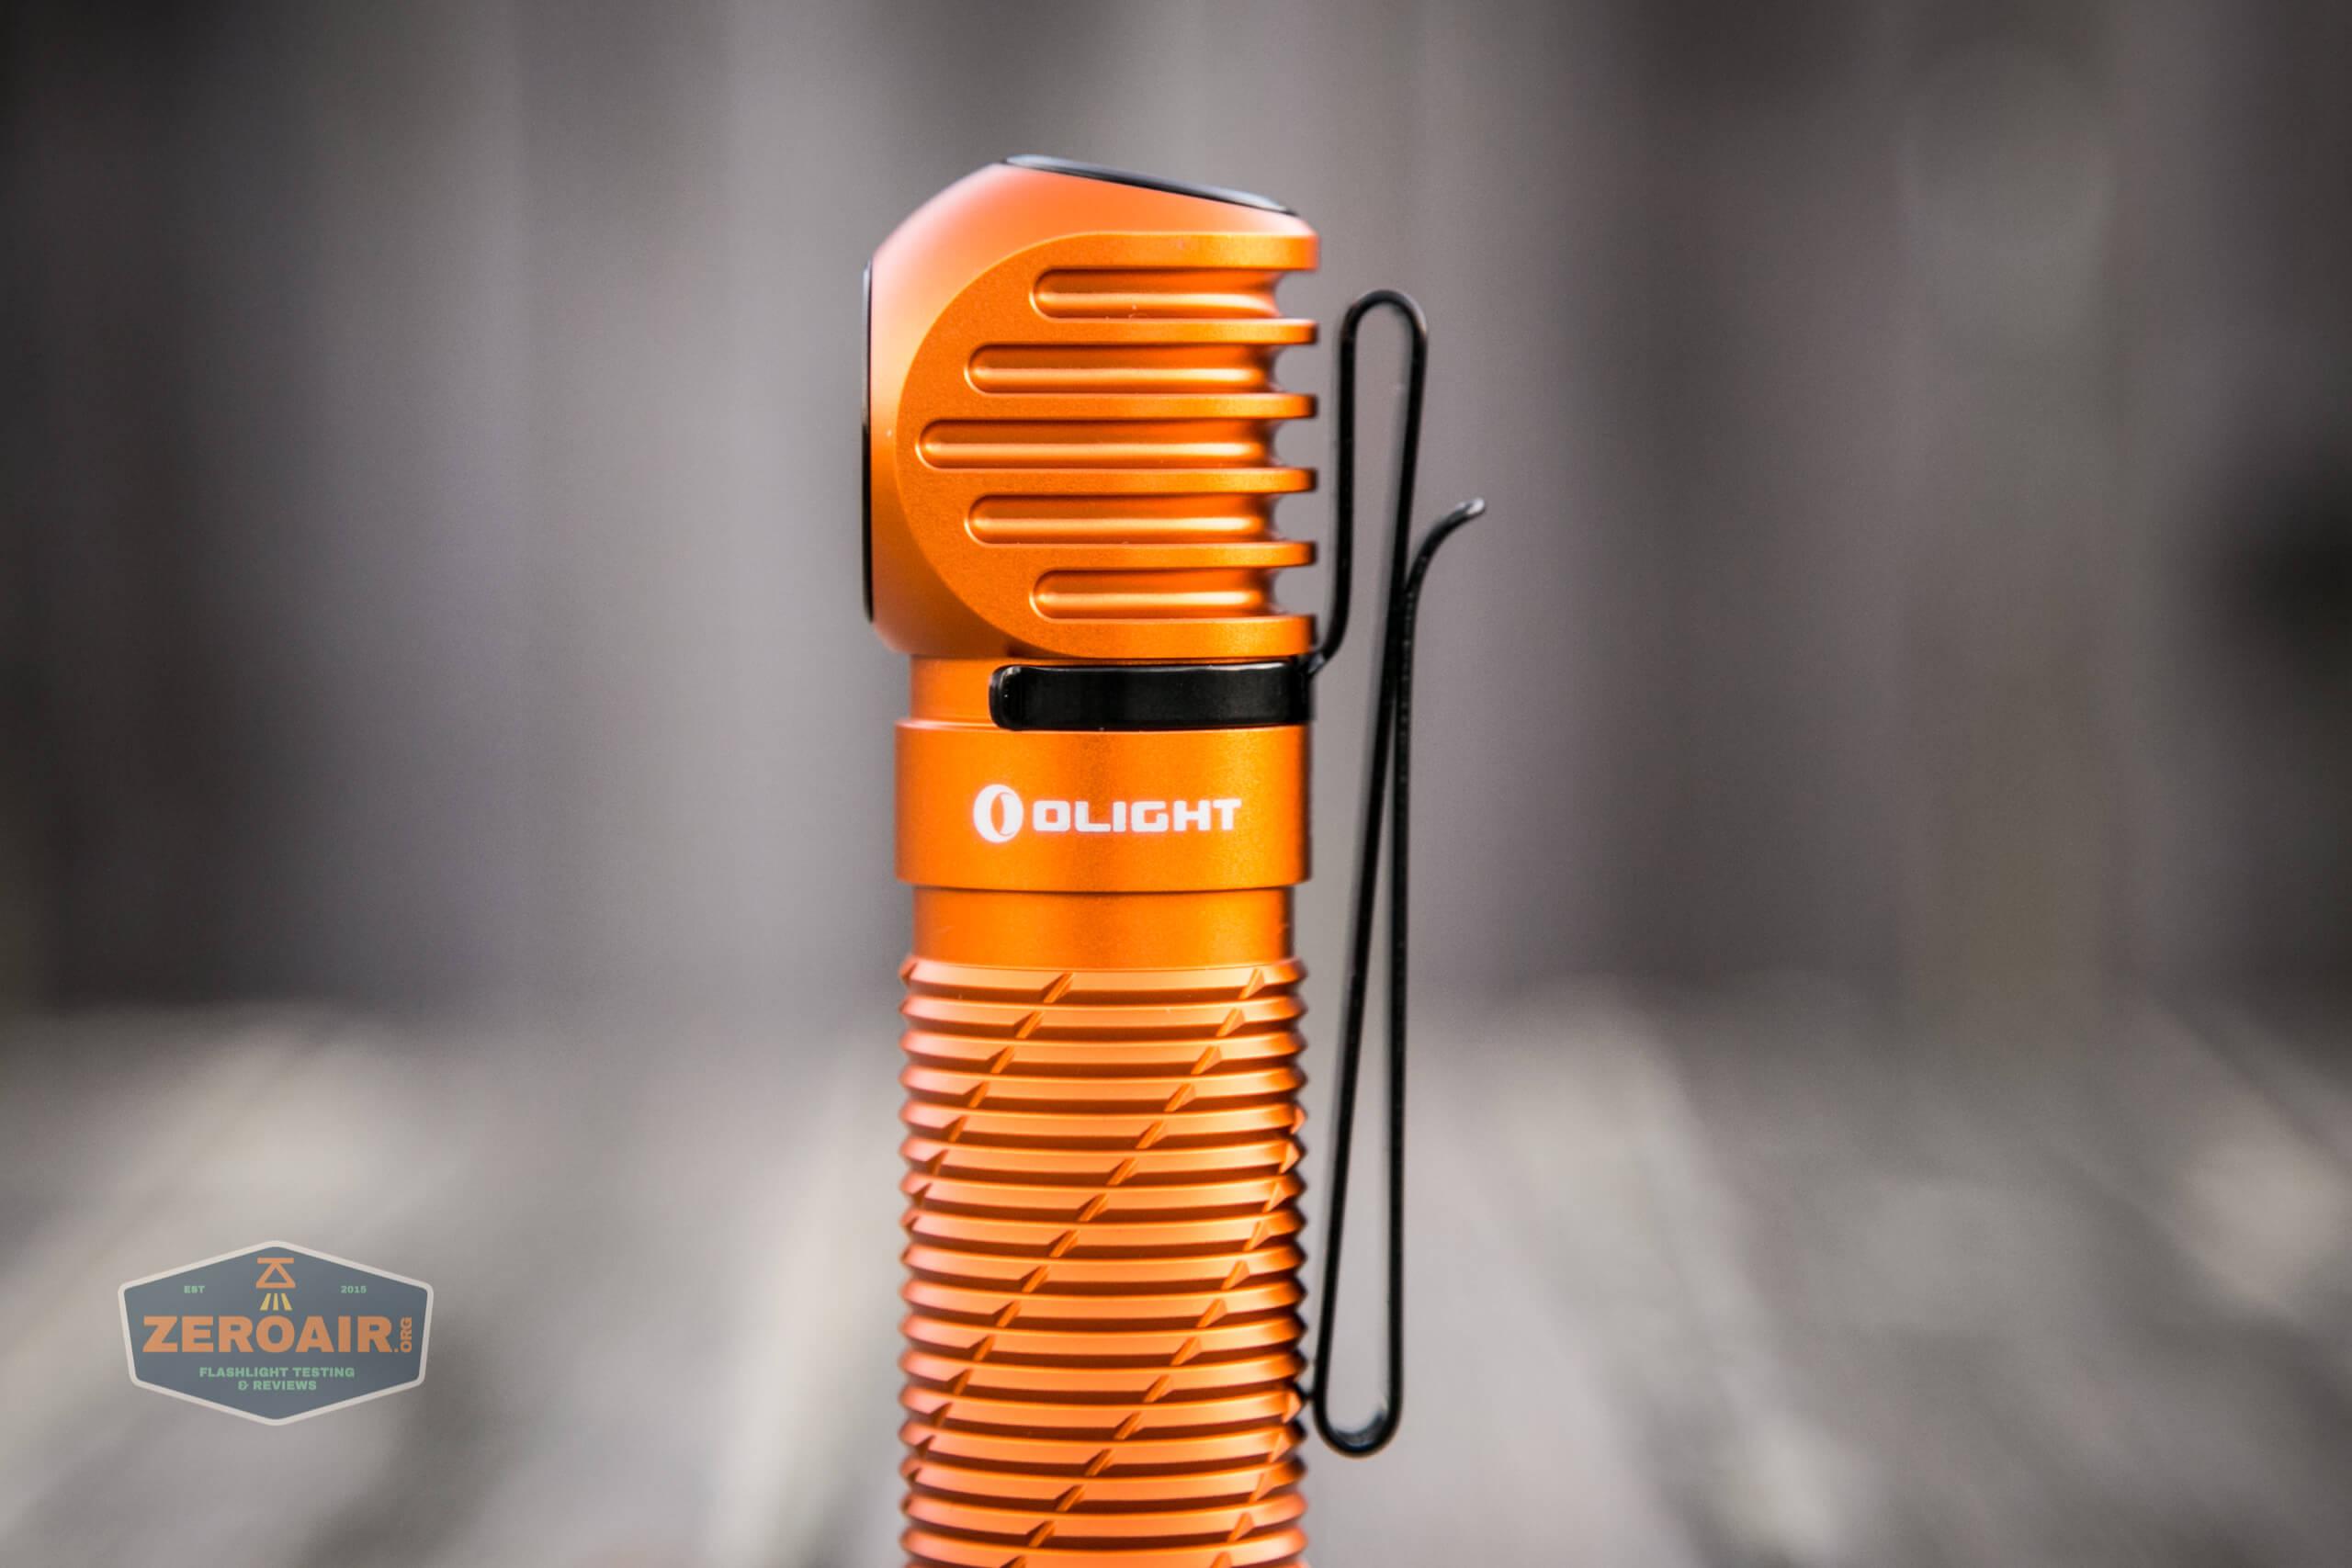 olight perun 2 21700 headlamp orange body detail